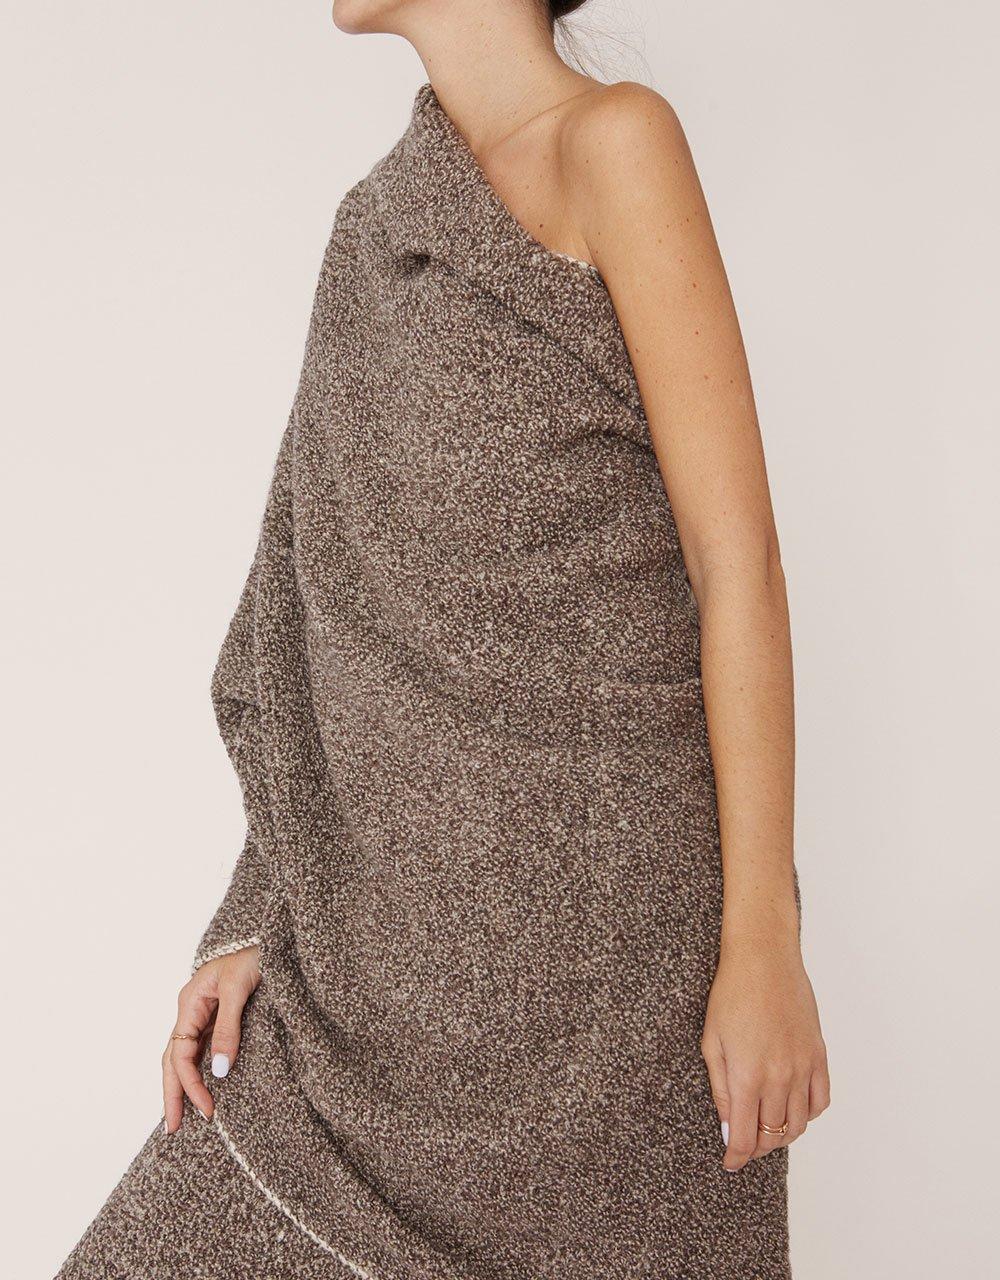 blanket02b